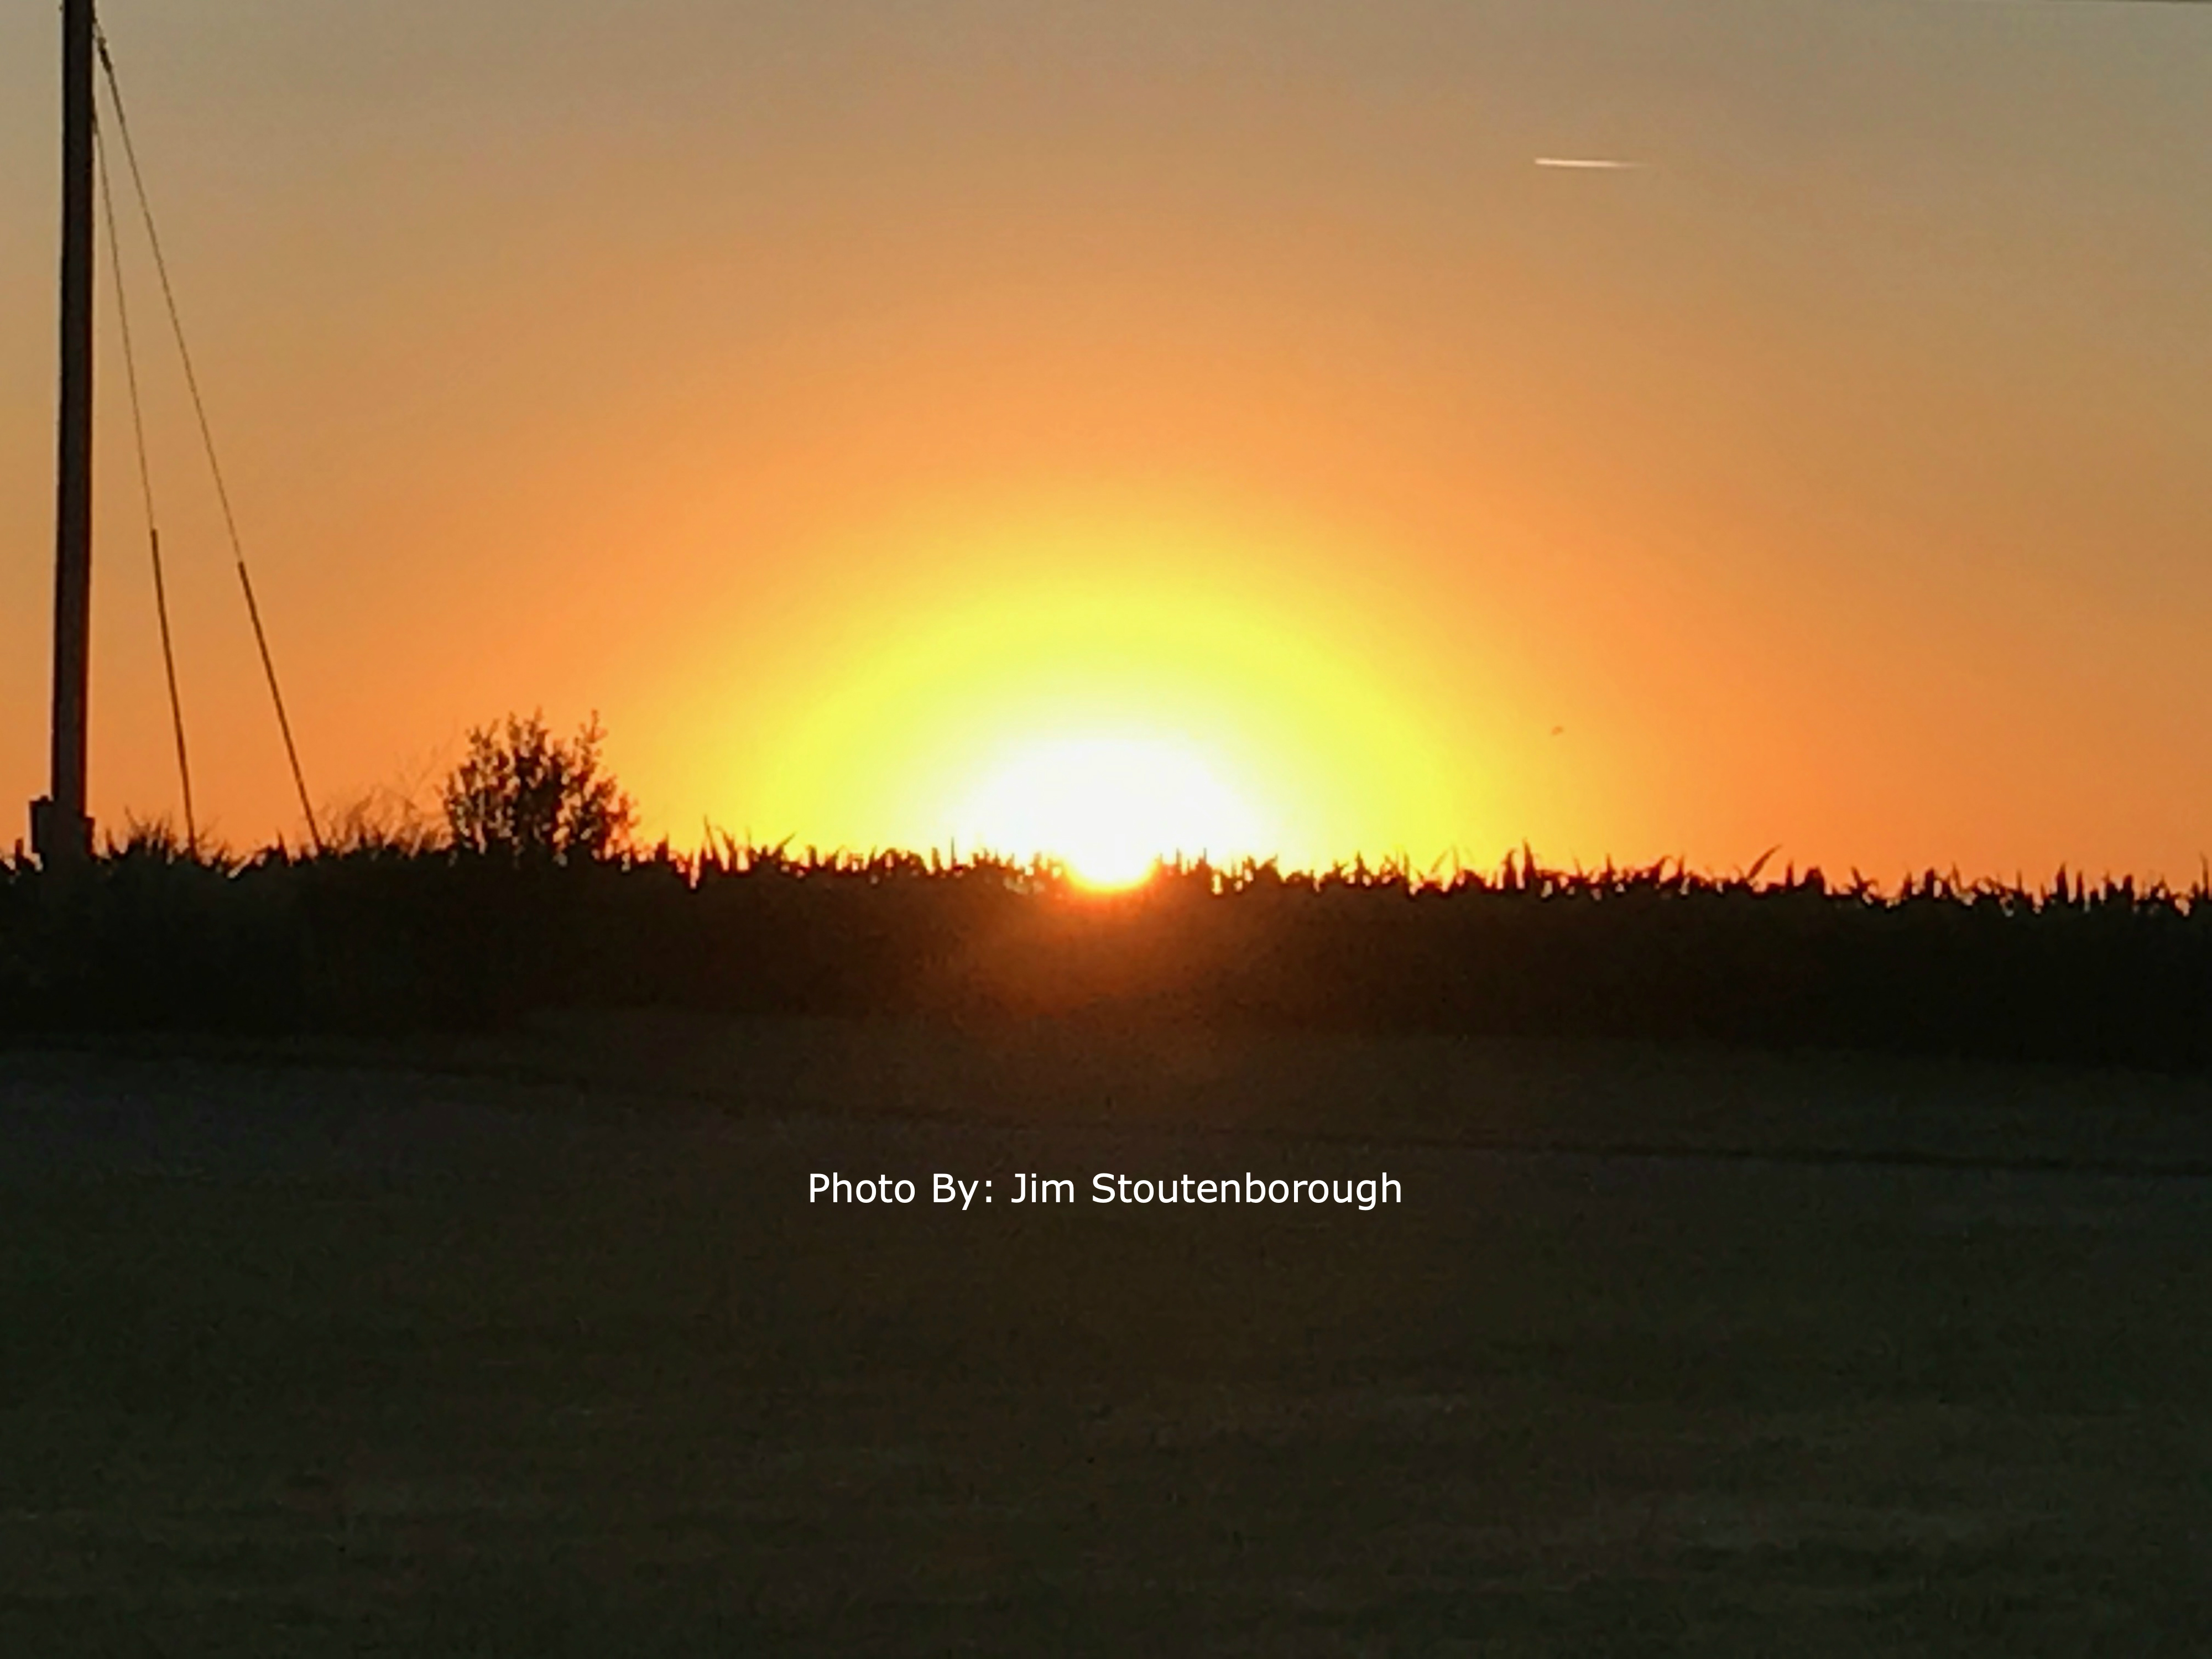 A New Beginning – It Looks Like a Sunrise